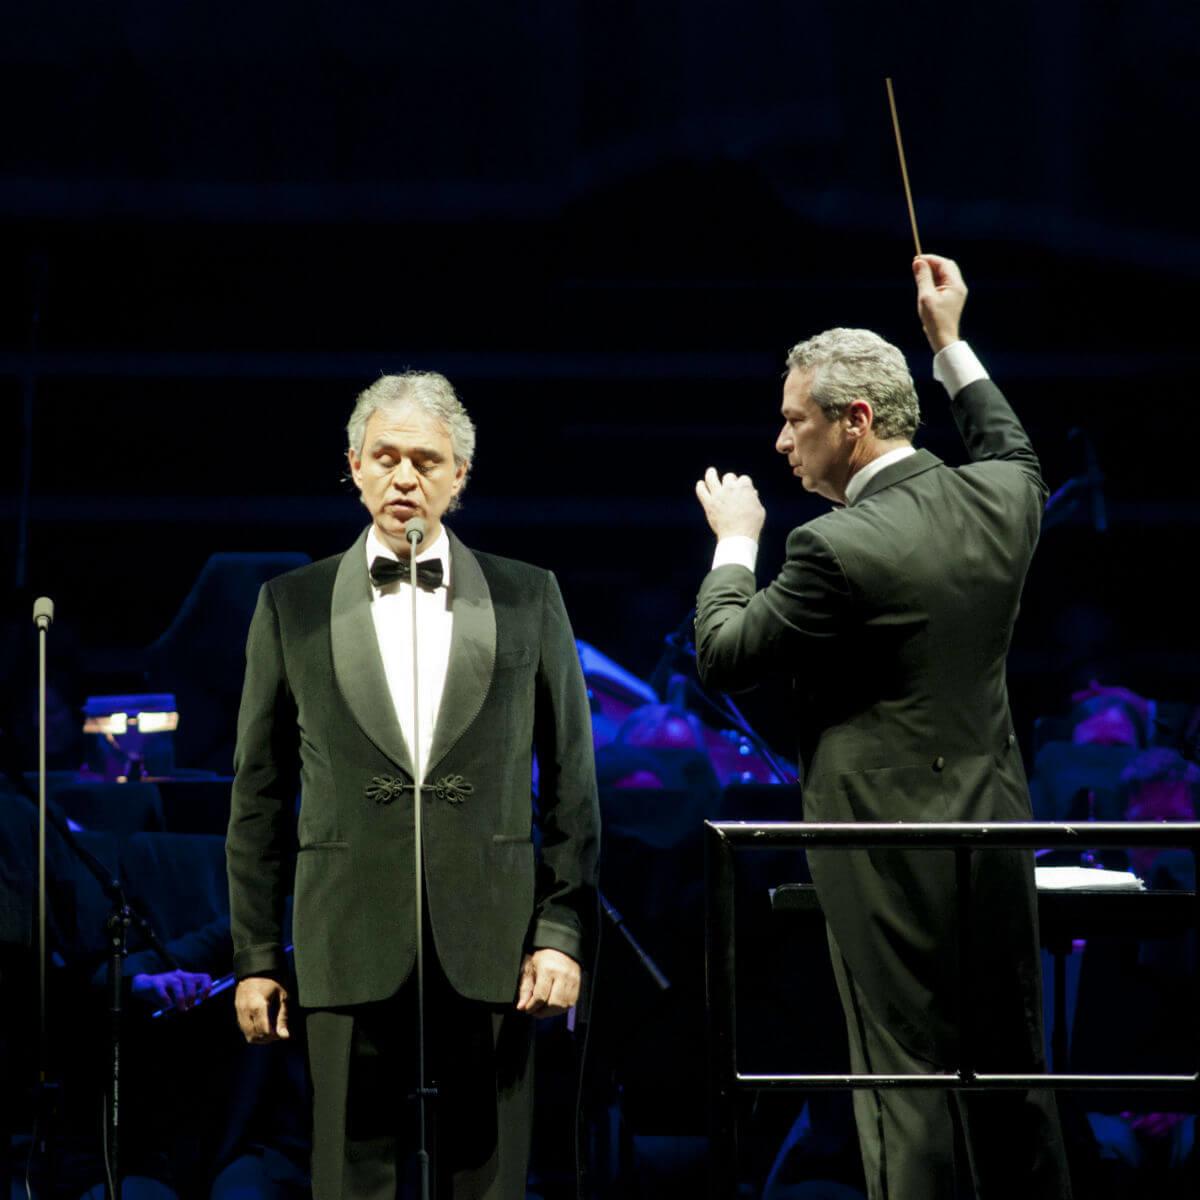 Andrea Bocelli, concert, November 2012